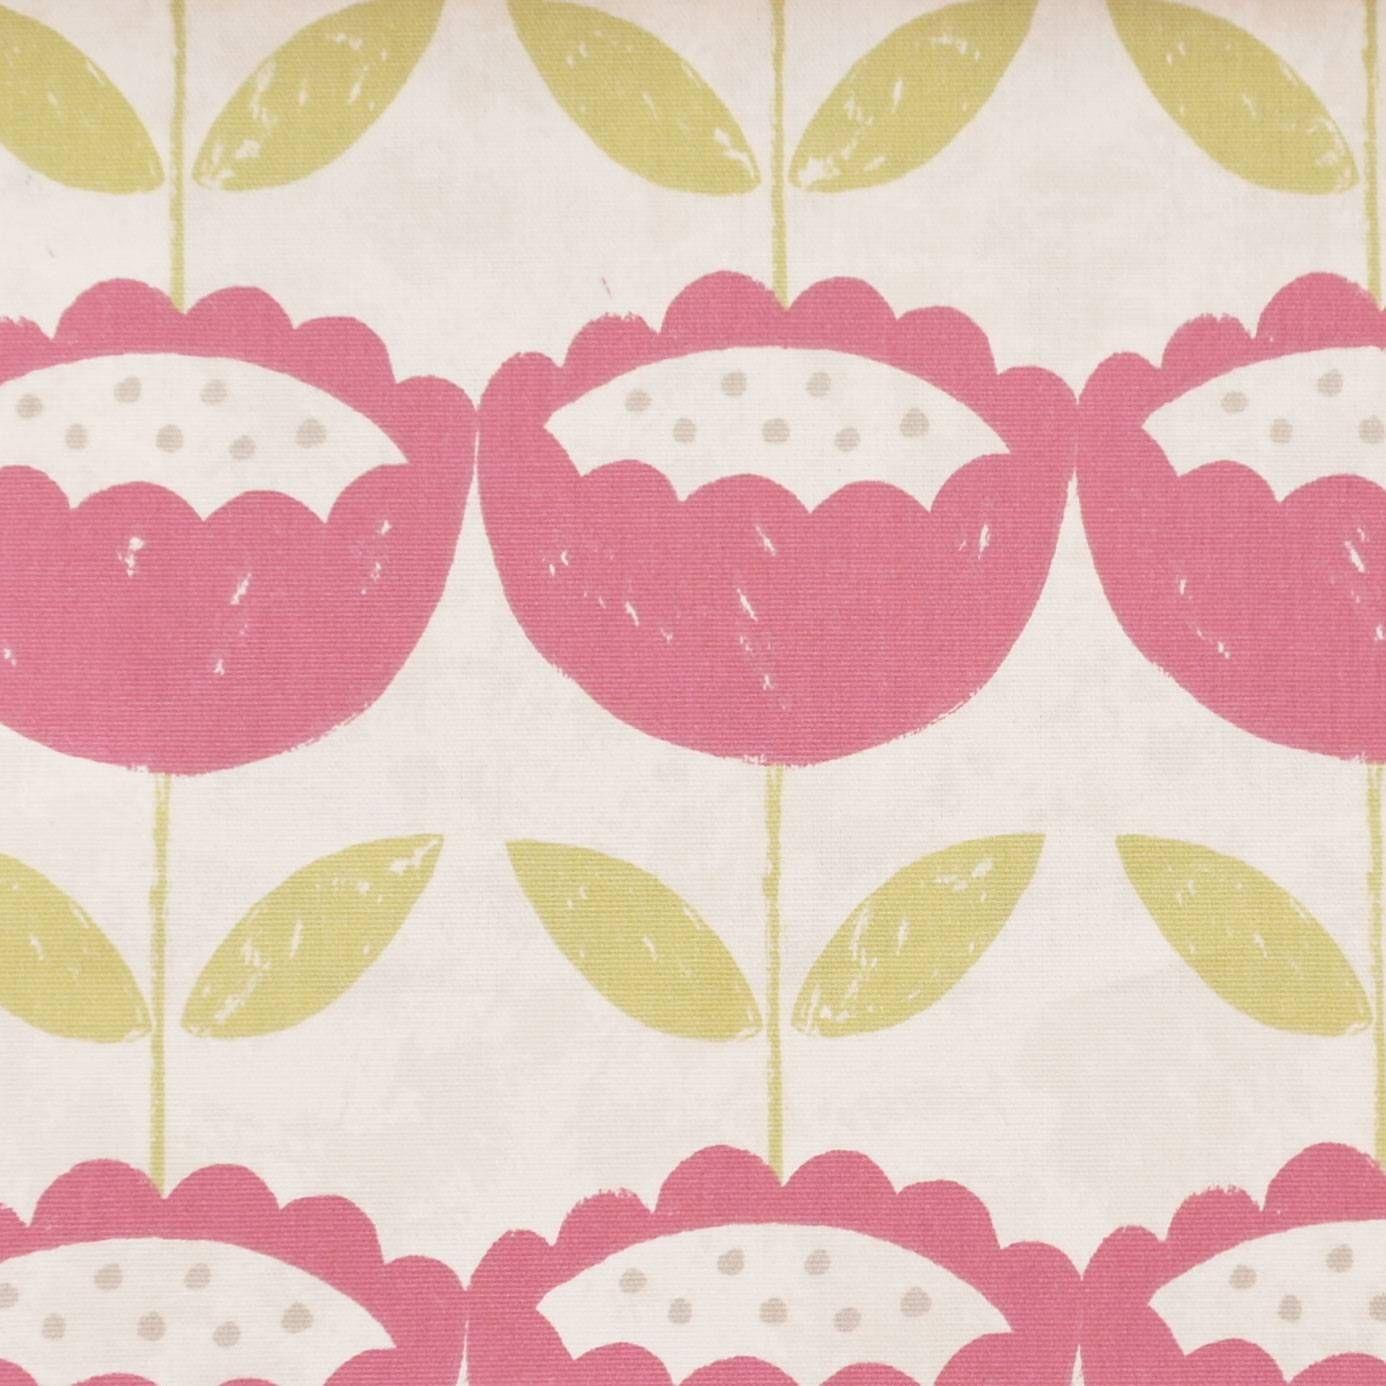 Anais Fabric - Summer (F0588/05) - Clarke & Clarke Folia Fabrics Collection